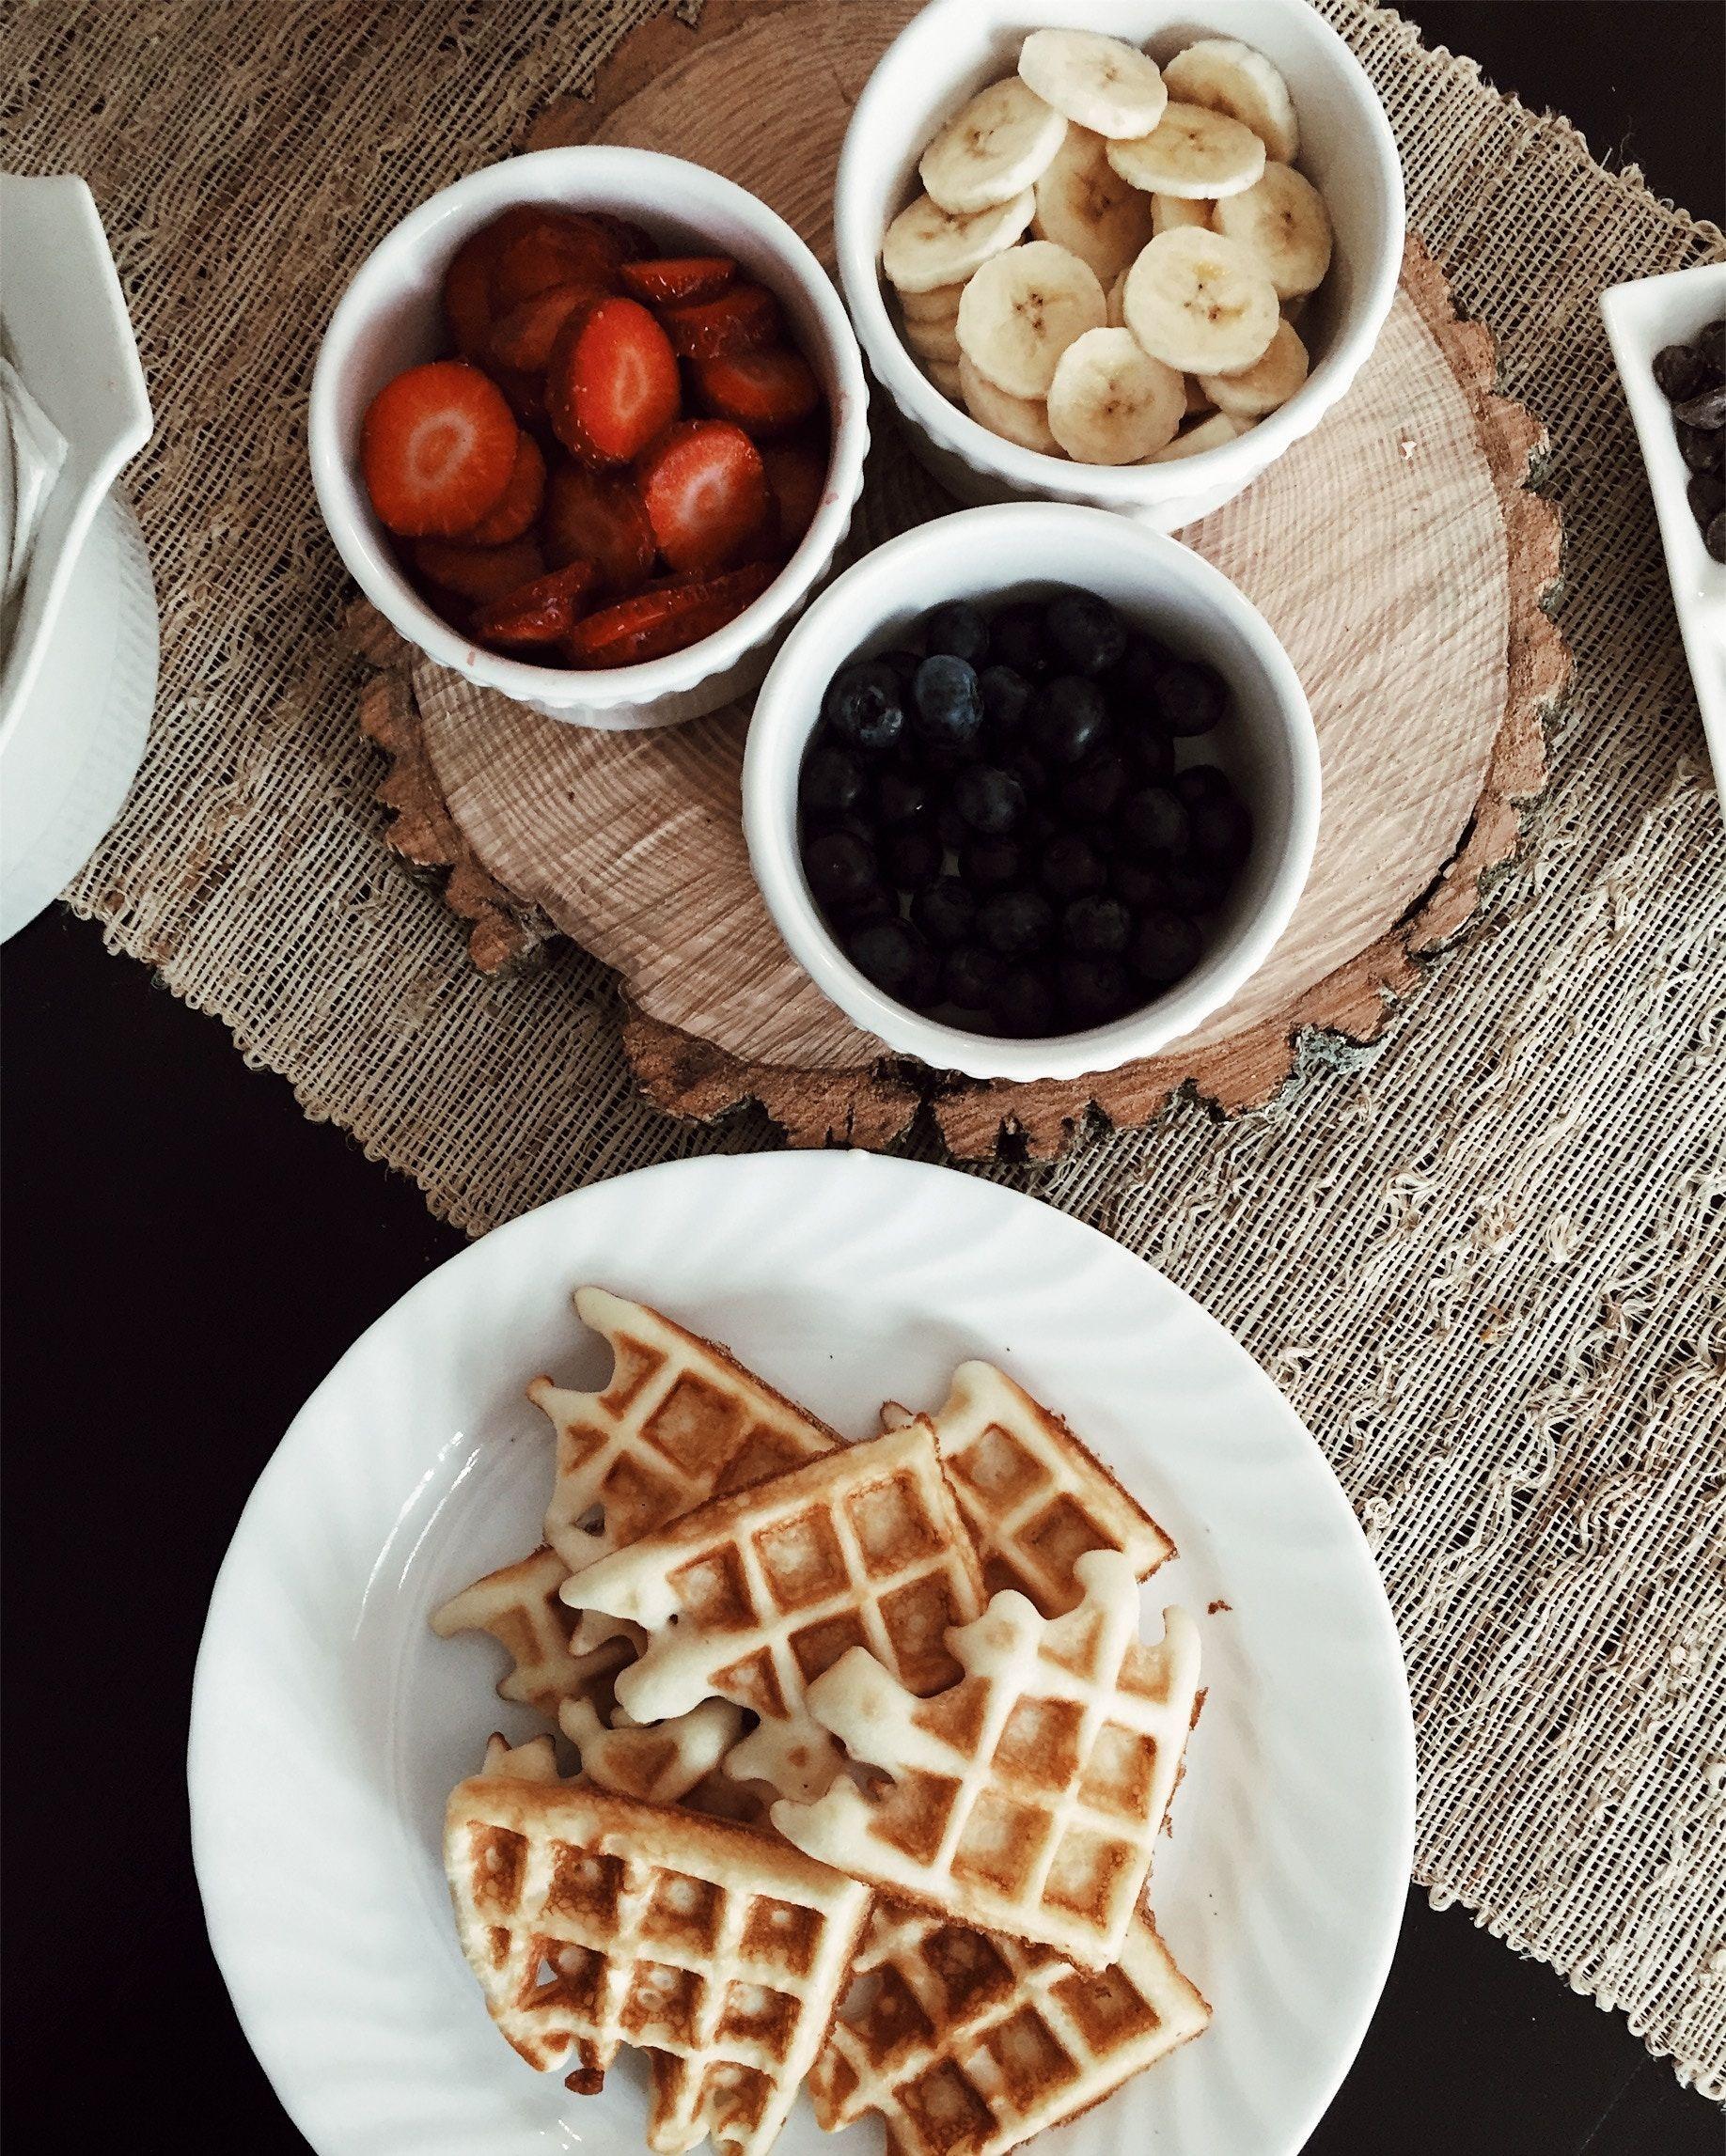 May 20 Waffles Gluten Egg Soy Milk Free